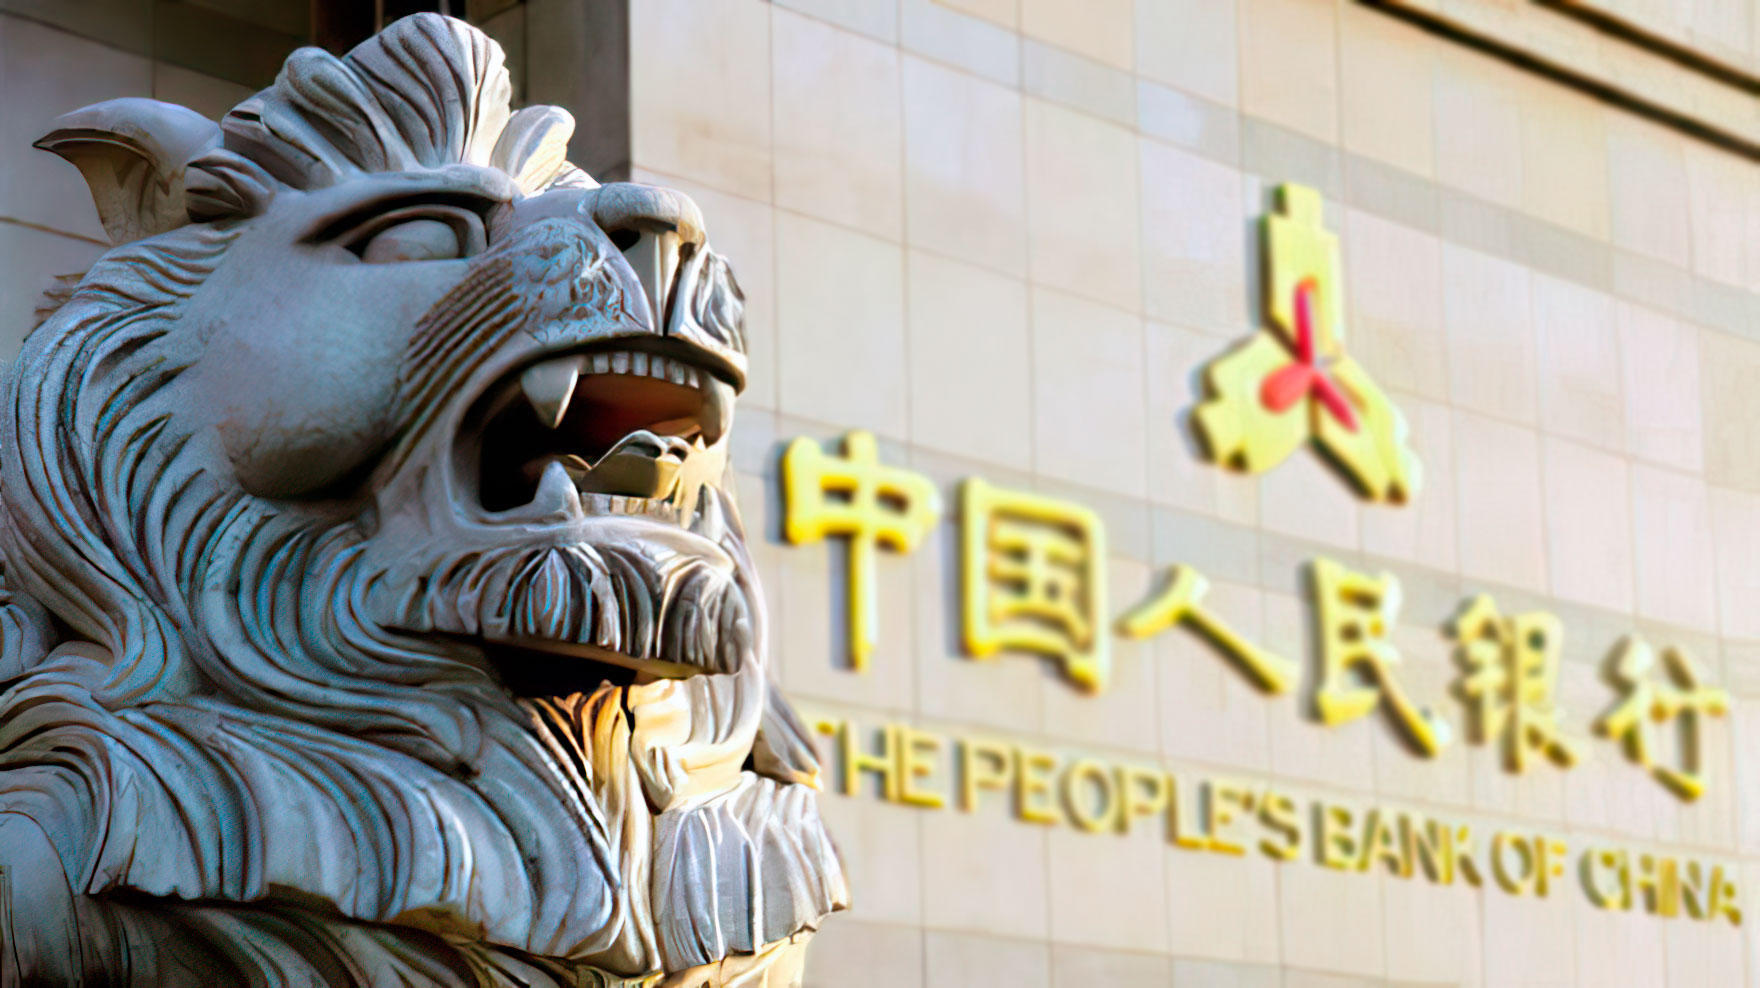 Китай вновь раздаст цифровой юань на сумму $3 миллиона